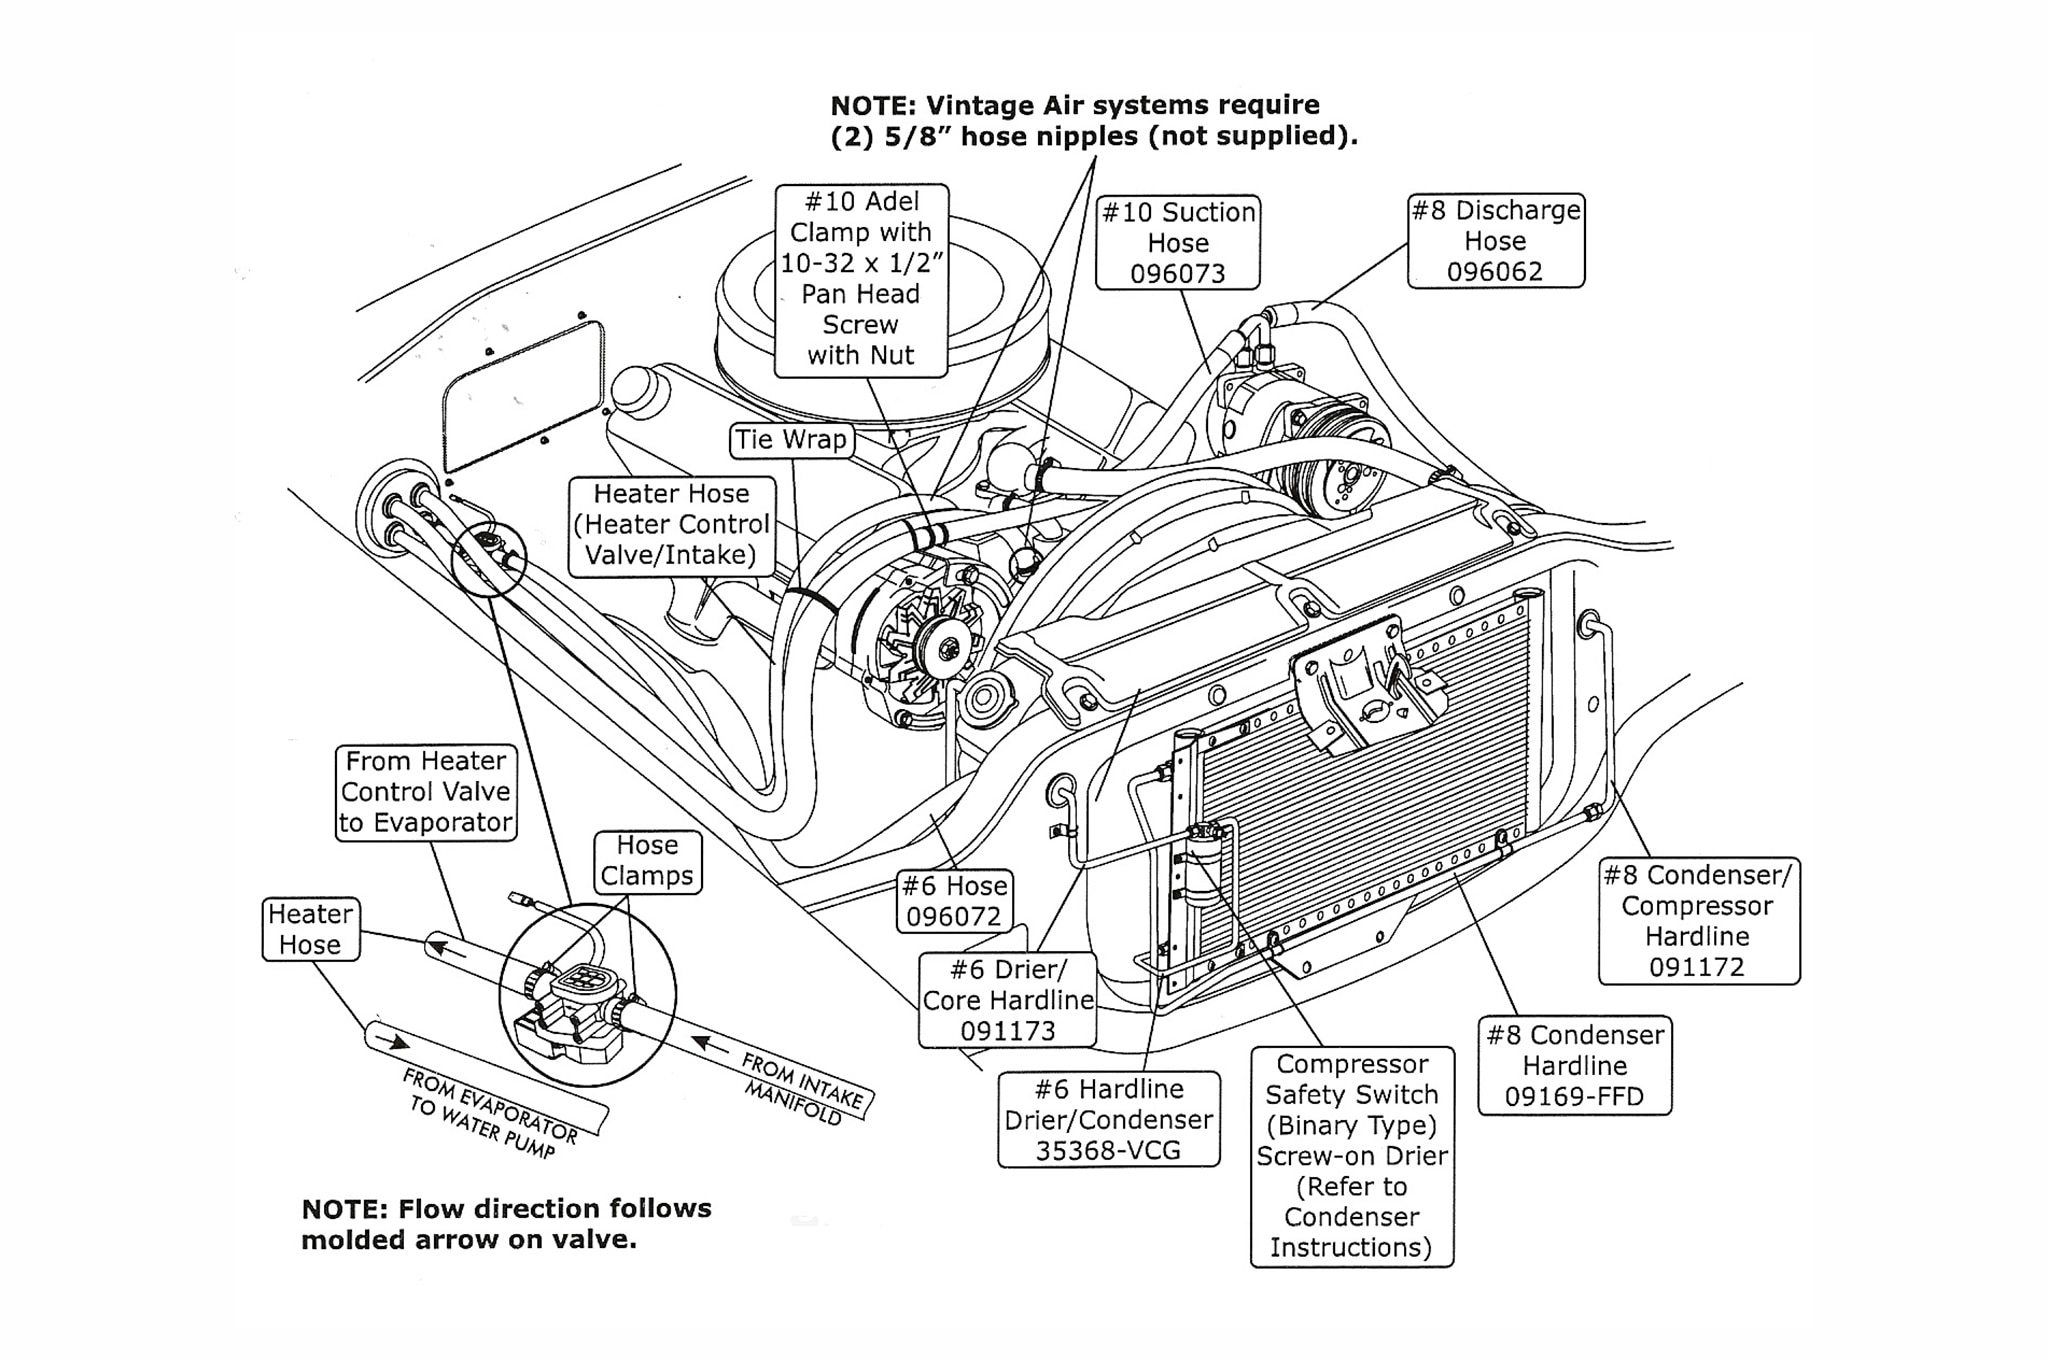 medium resolution of chevelle alternator wiring diagram on 1967 chevelle alternator wiring diagram 66 chevelle